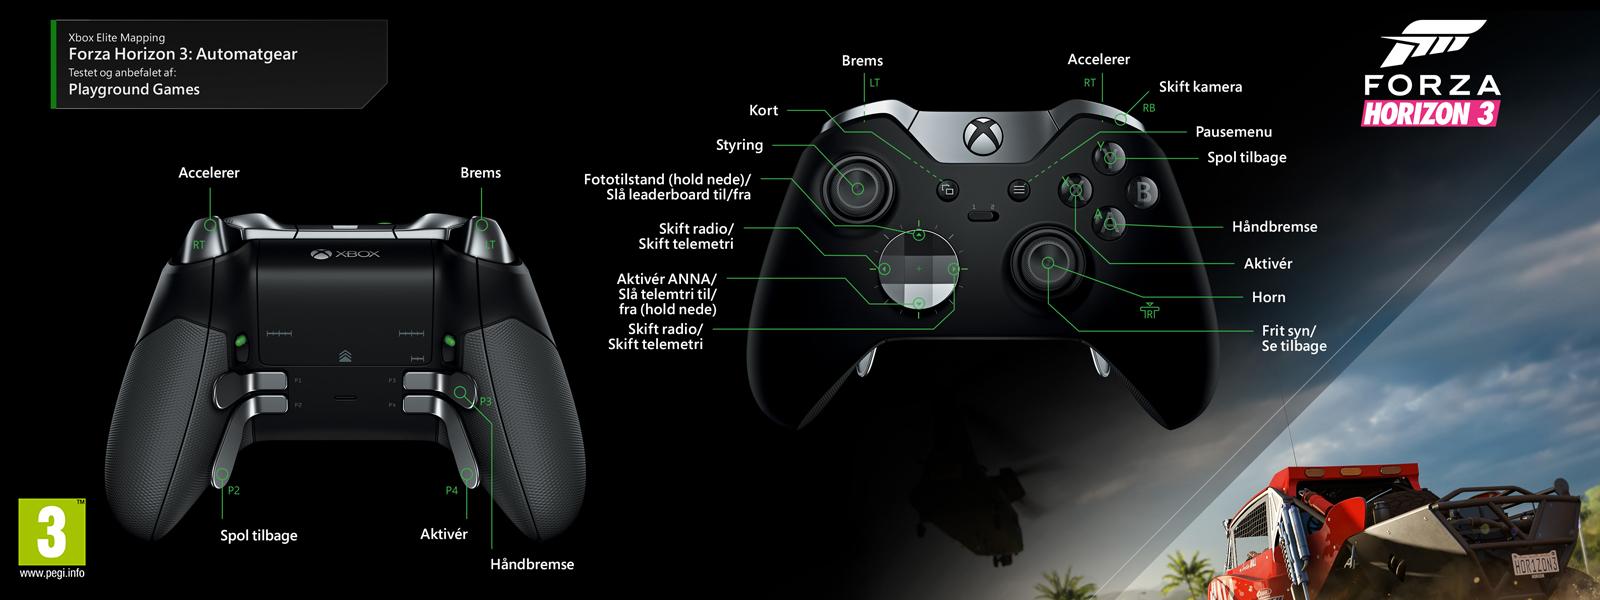 Forza Horizon 3 – Elite-konfiguration til automatgear